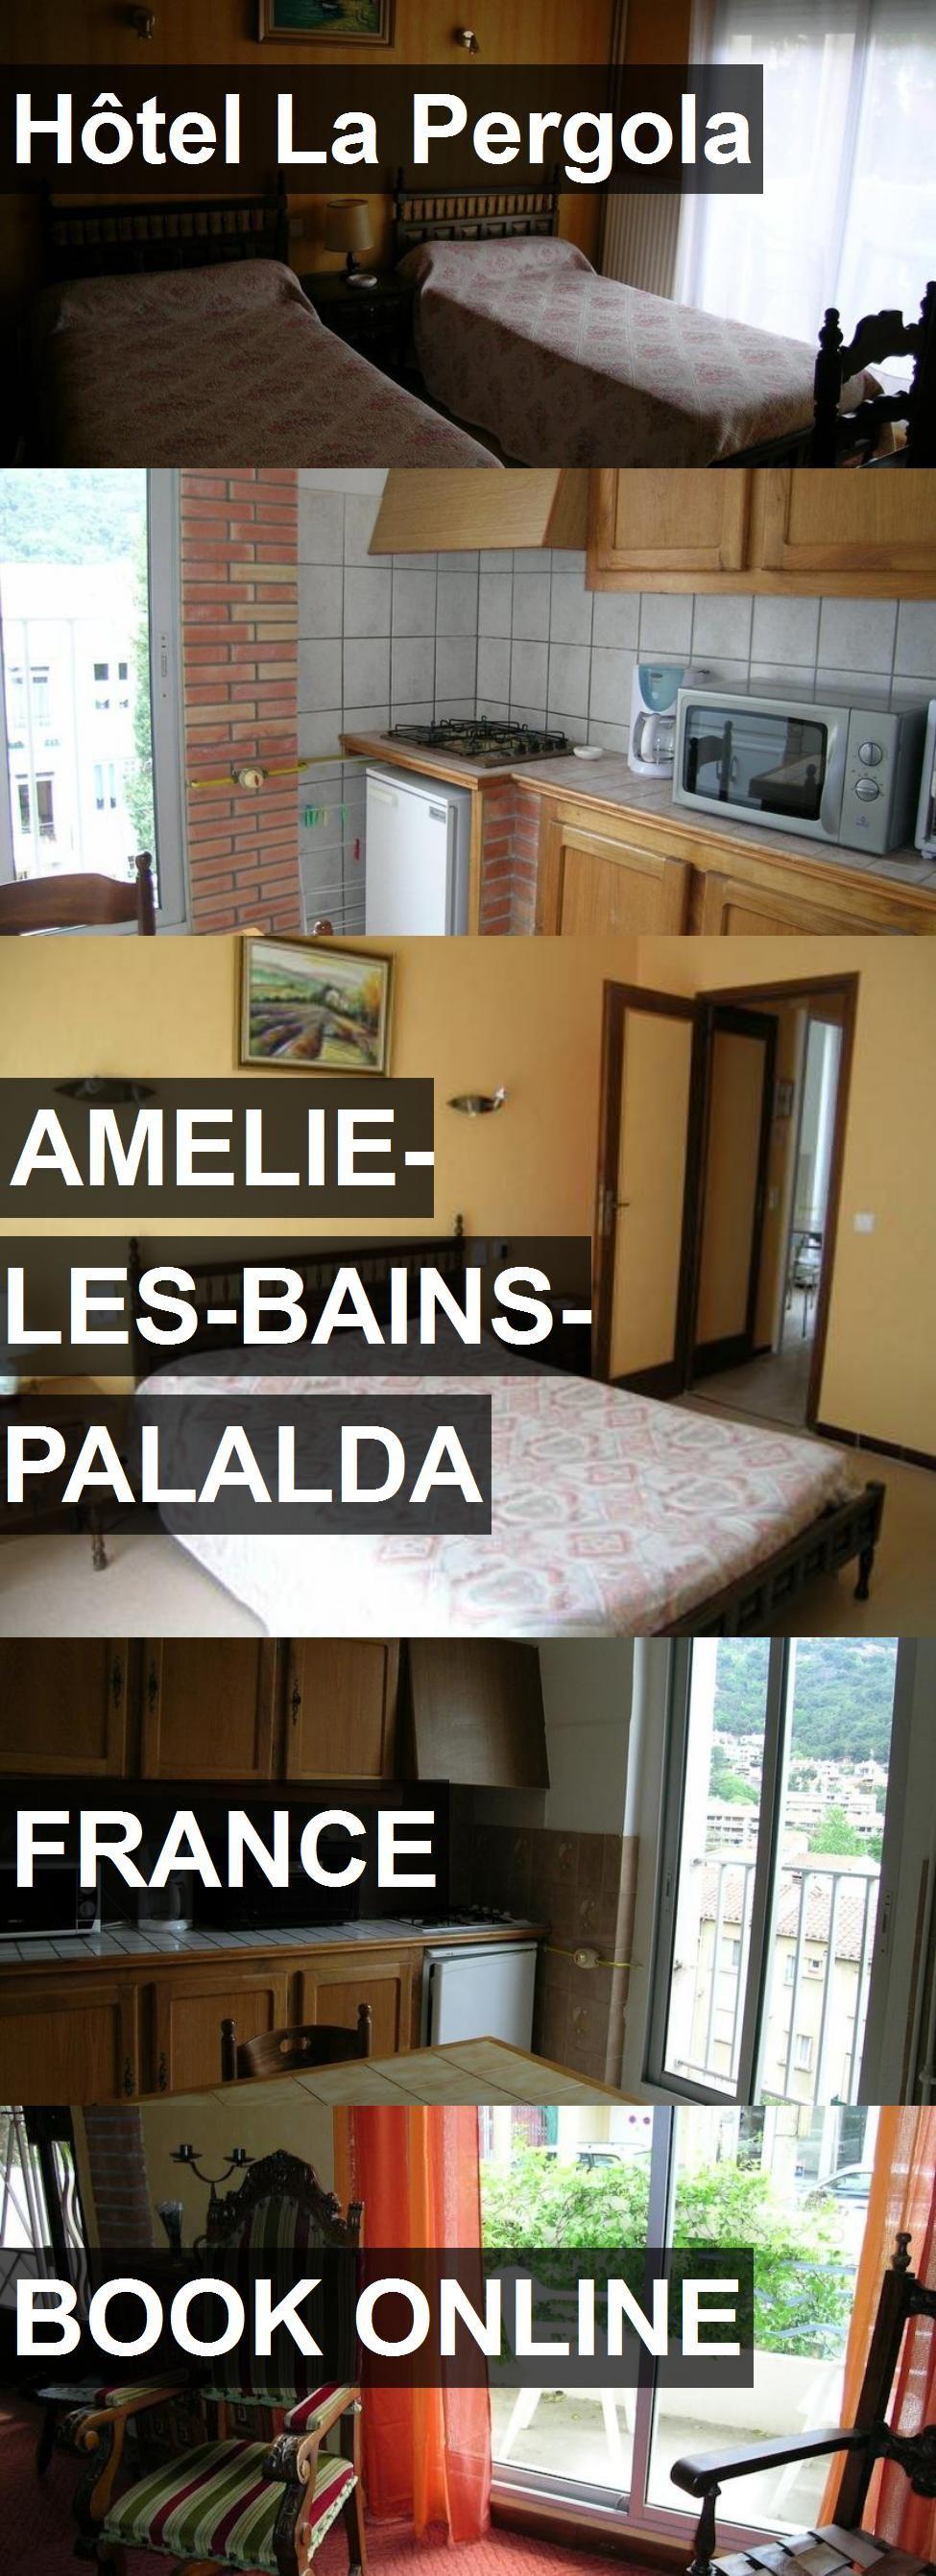 Hotel Hôtel La Pergola in AmelielesBainsPalalda, France